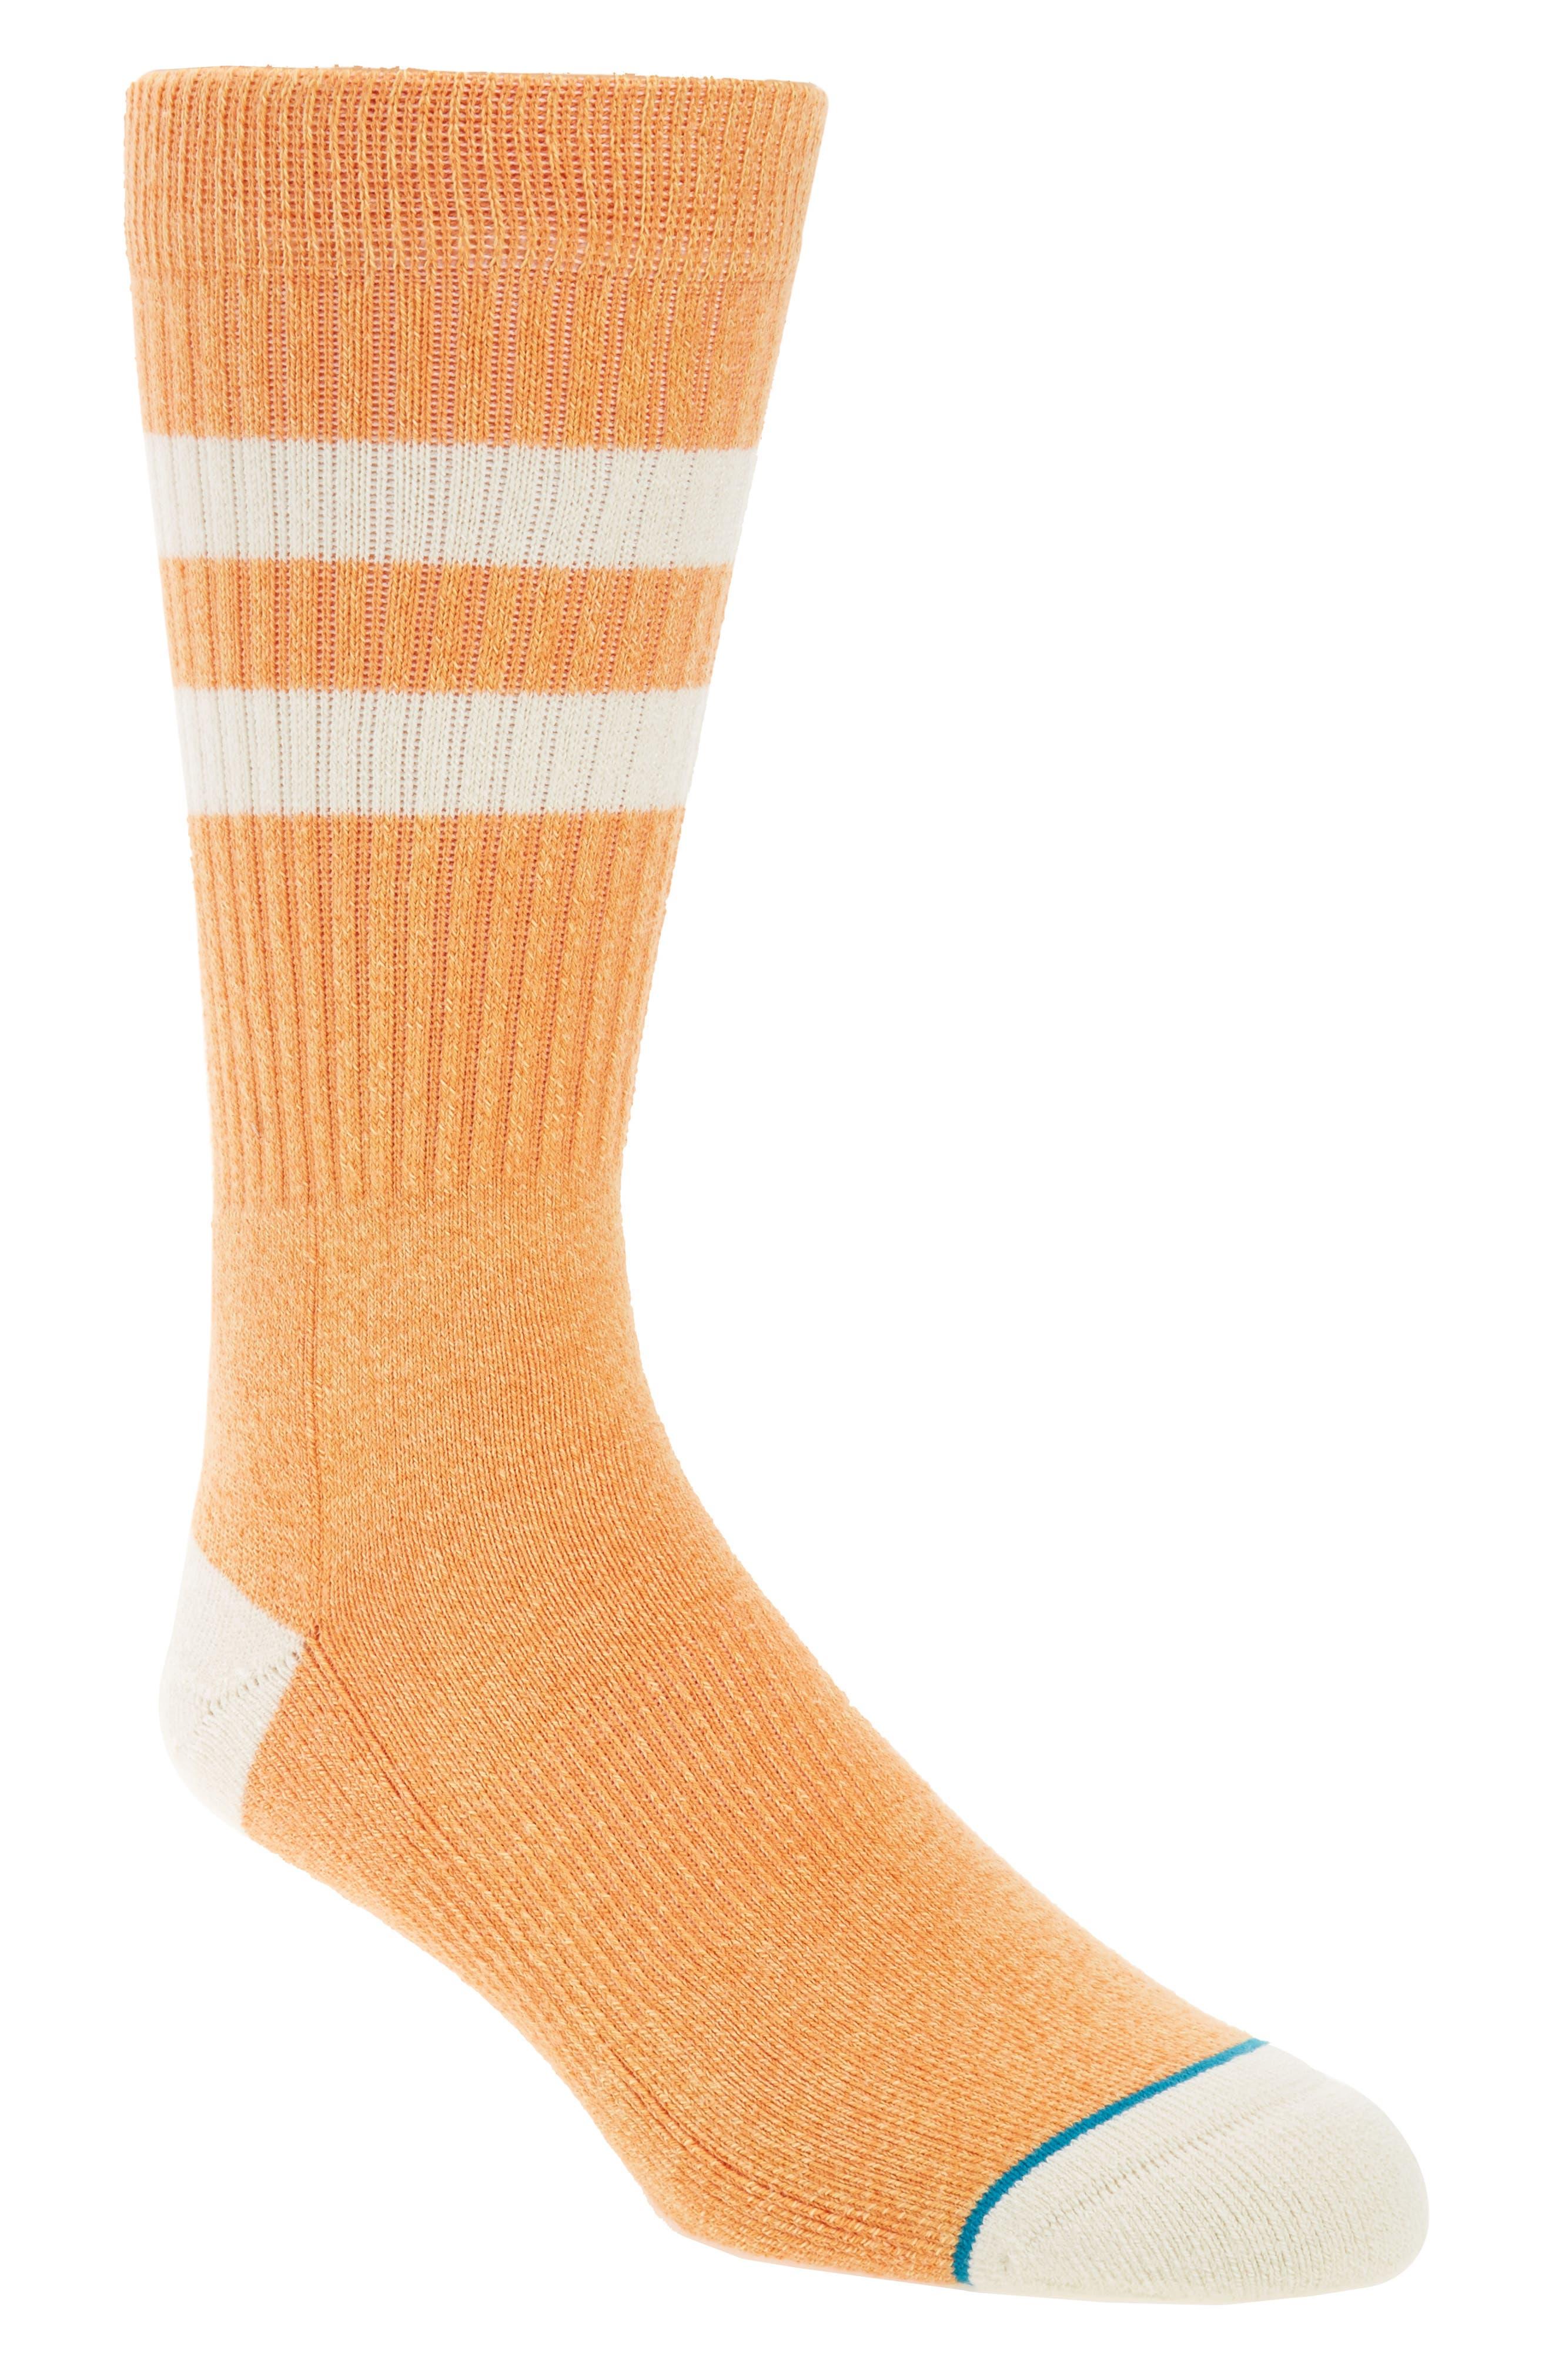 Alternate Image 1 Selected - Stance Salty Crew Socks